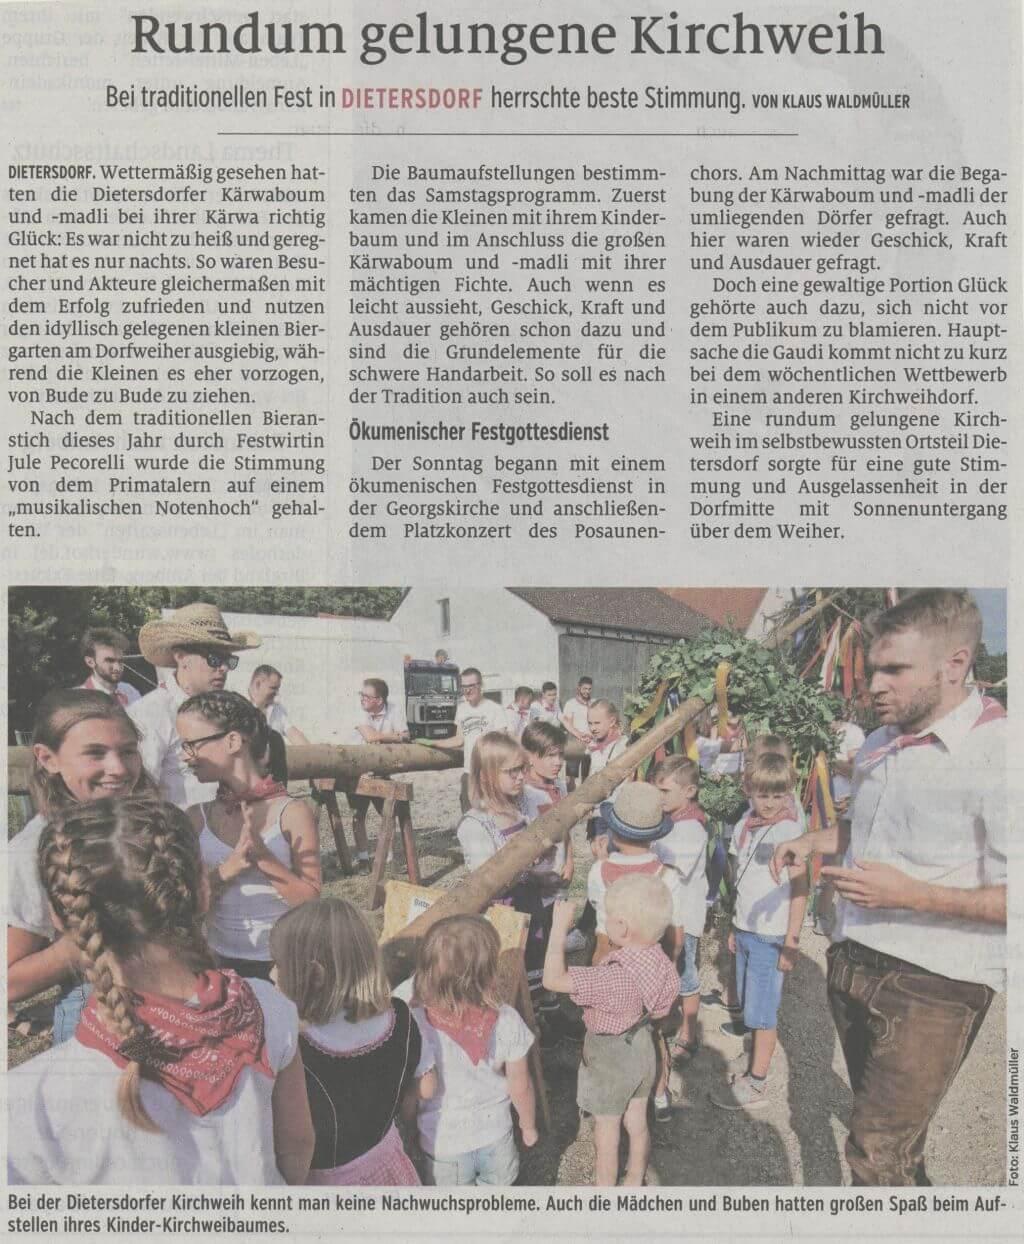 08.07.2019 - Rundum gelungene Kirchweih - Schwabacher Tagblatt